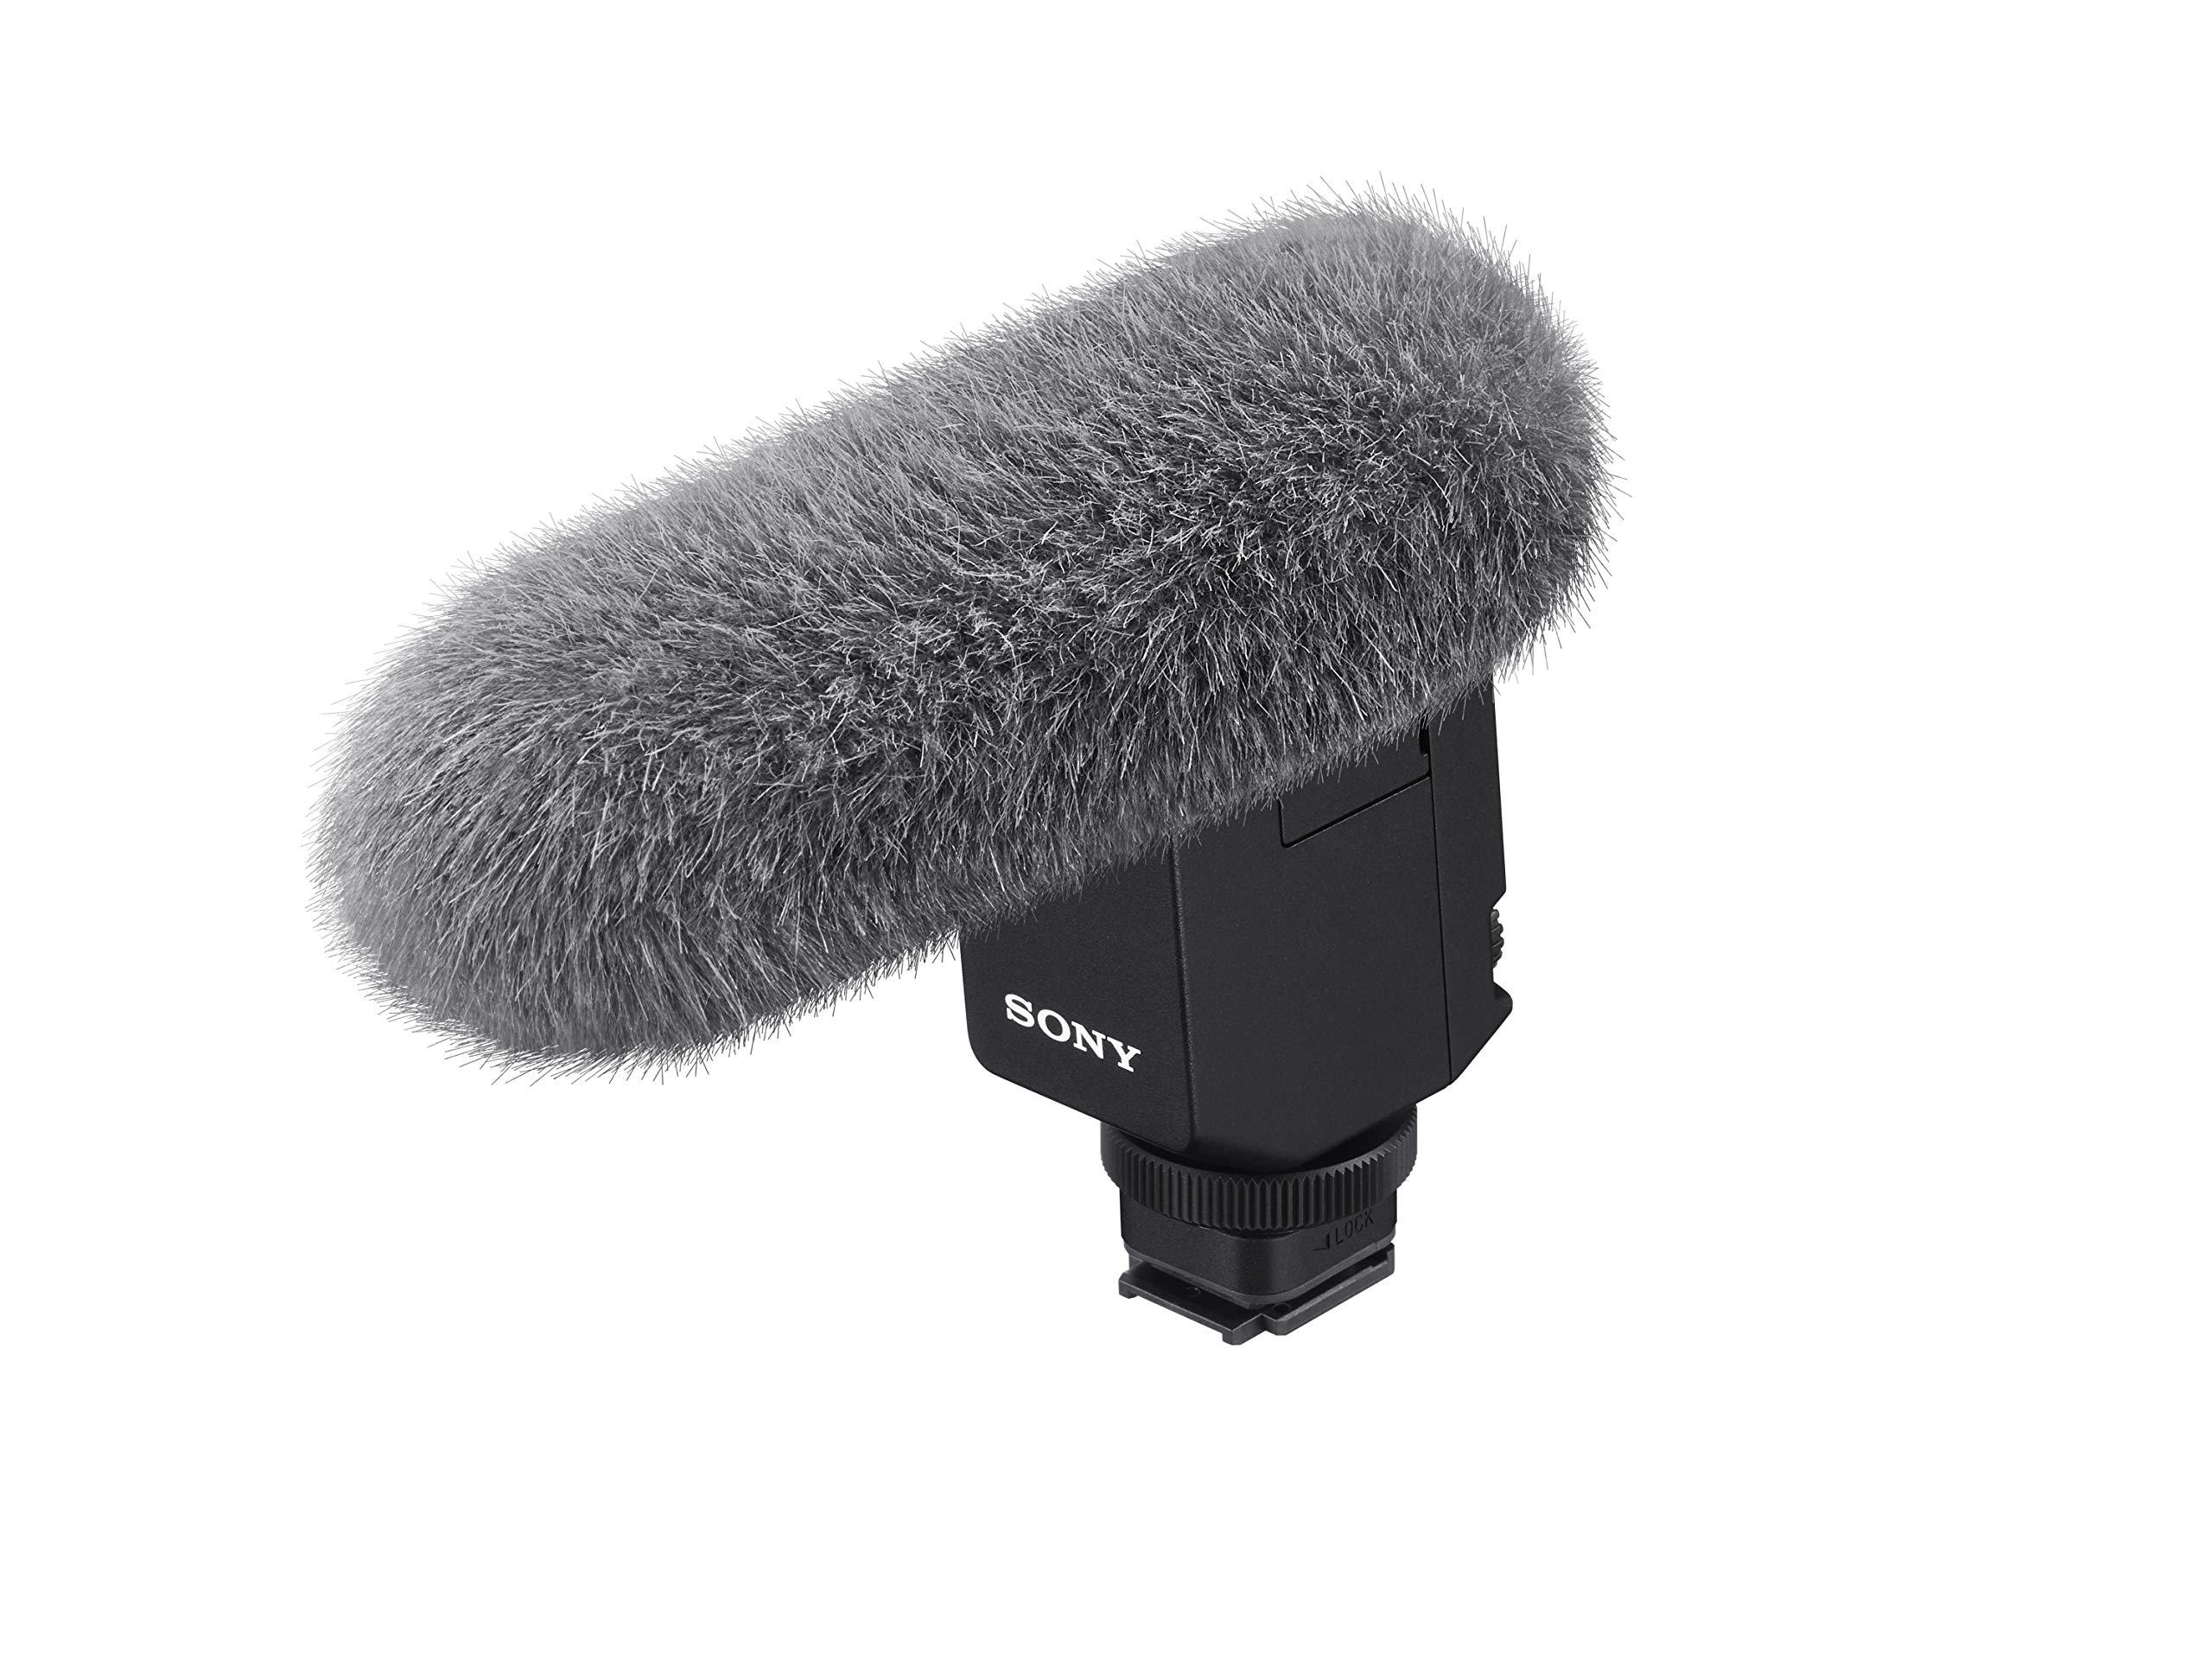 Sony ECM-B1M Compact Shotgun Microphone with Digital Audio Interface by Sony